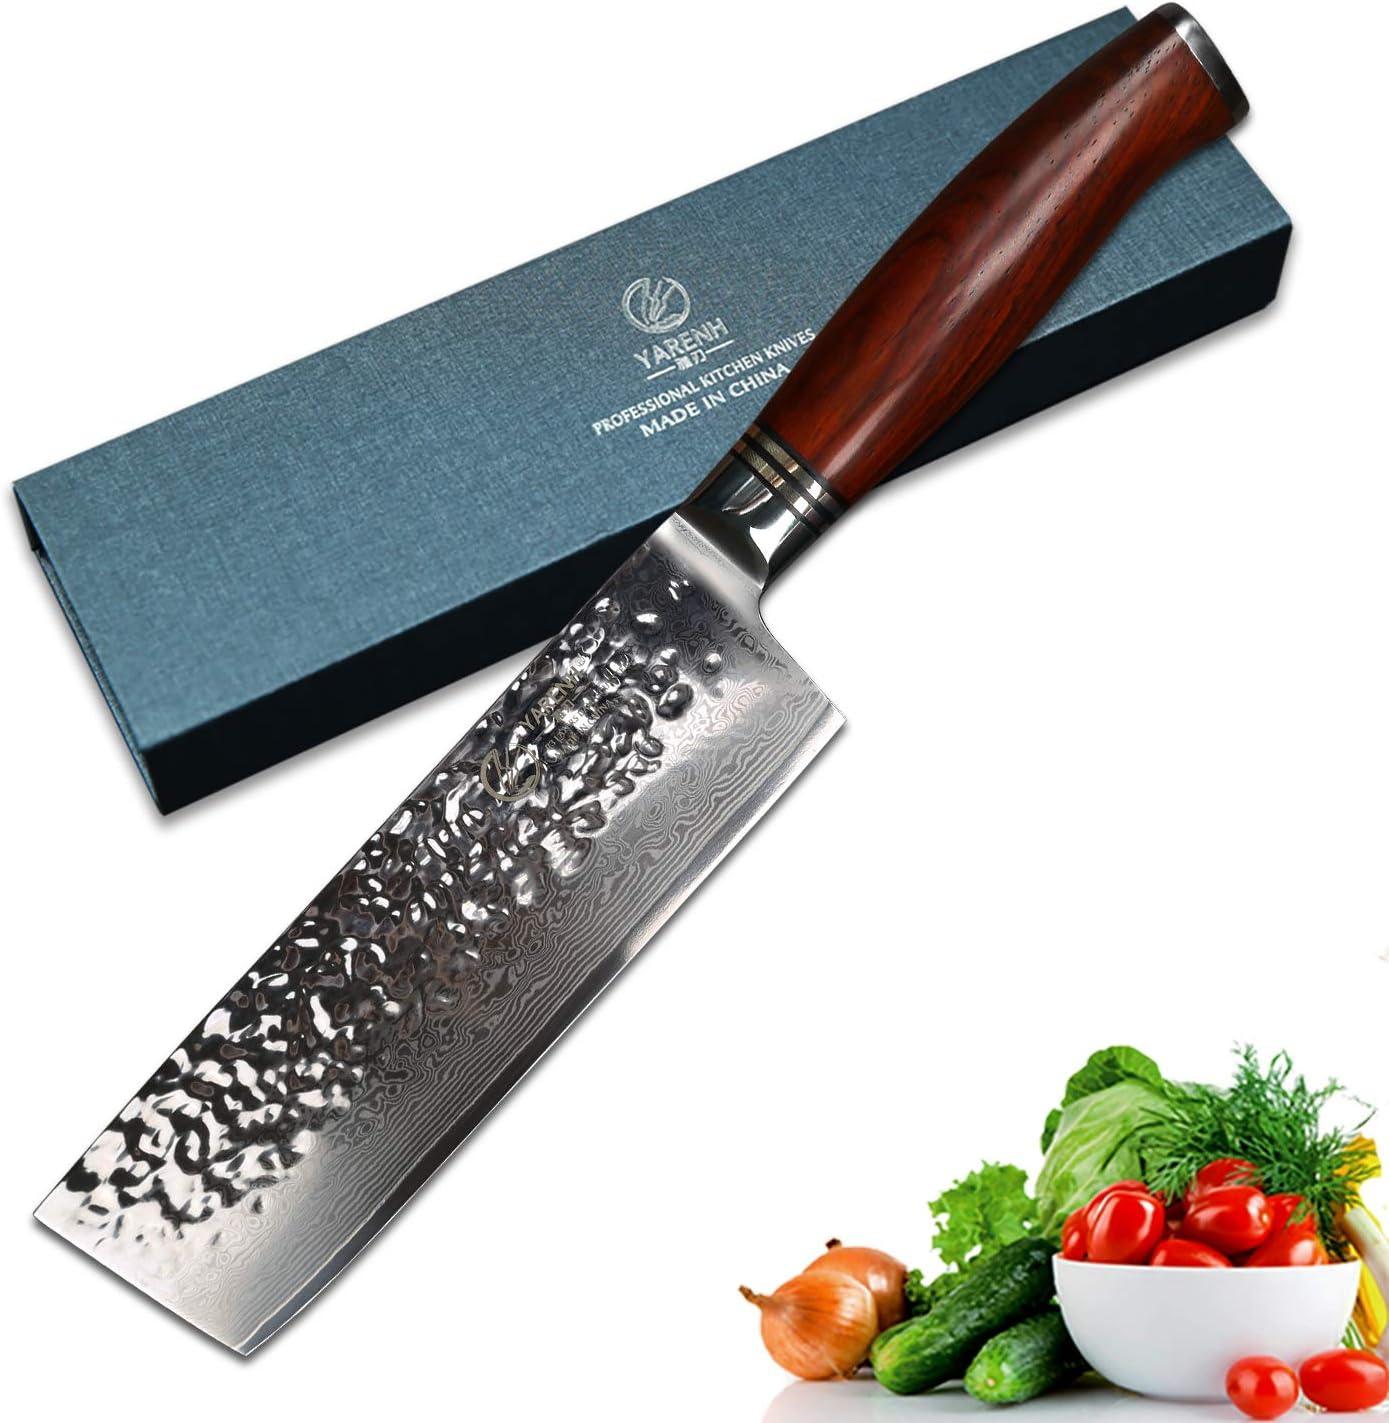 Compra YARENH Cuchillos de Cocina Verdura 17cm - Cuchillo de Cocina Profesional de Acero de Japones Damasco - Mango de Madera Dalbergia - Cuchillos de Cocinero Ultra Filoso HTT-Serie en Amazon.es